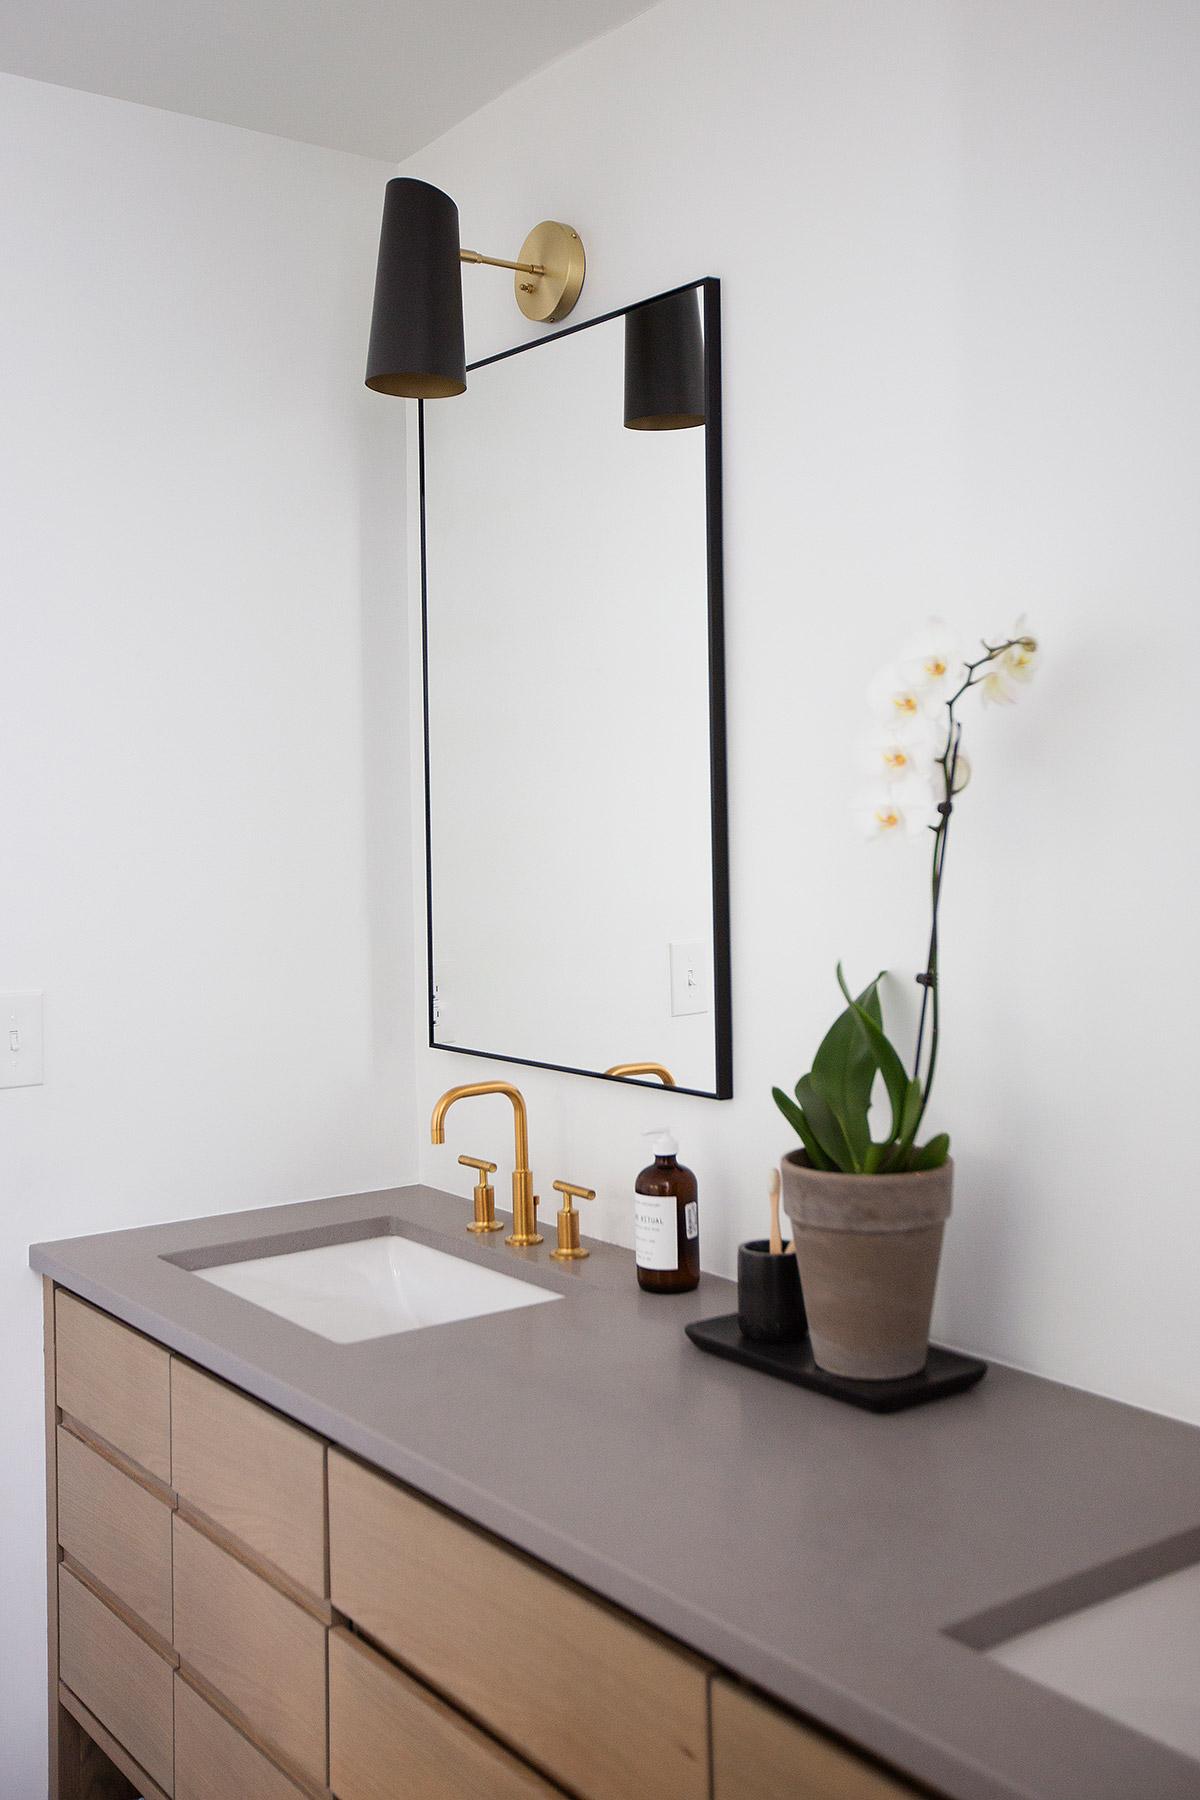 Built-in vanity with grey countertop in midcentury master bathroom